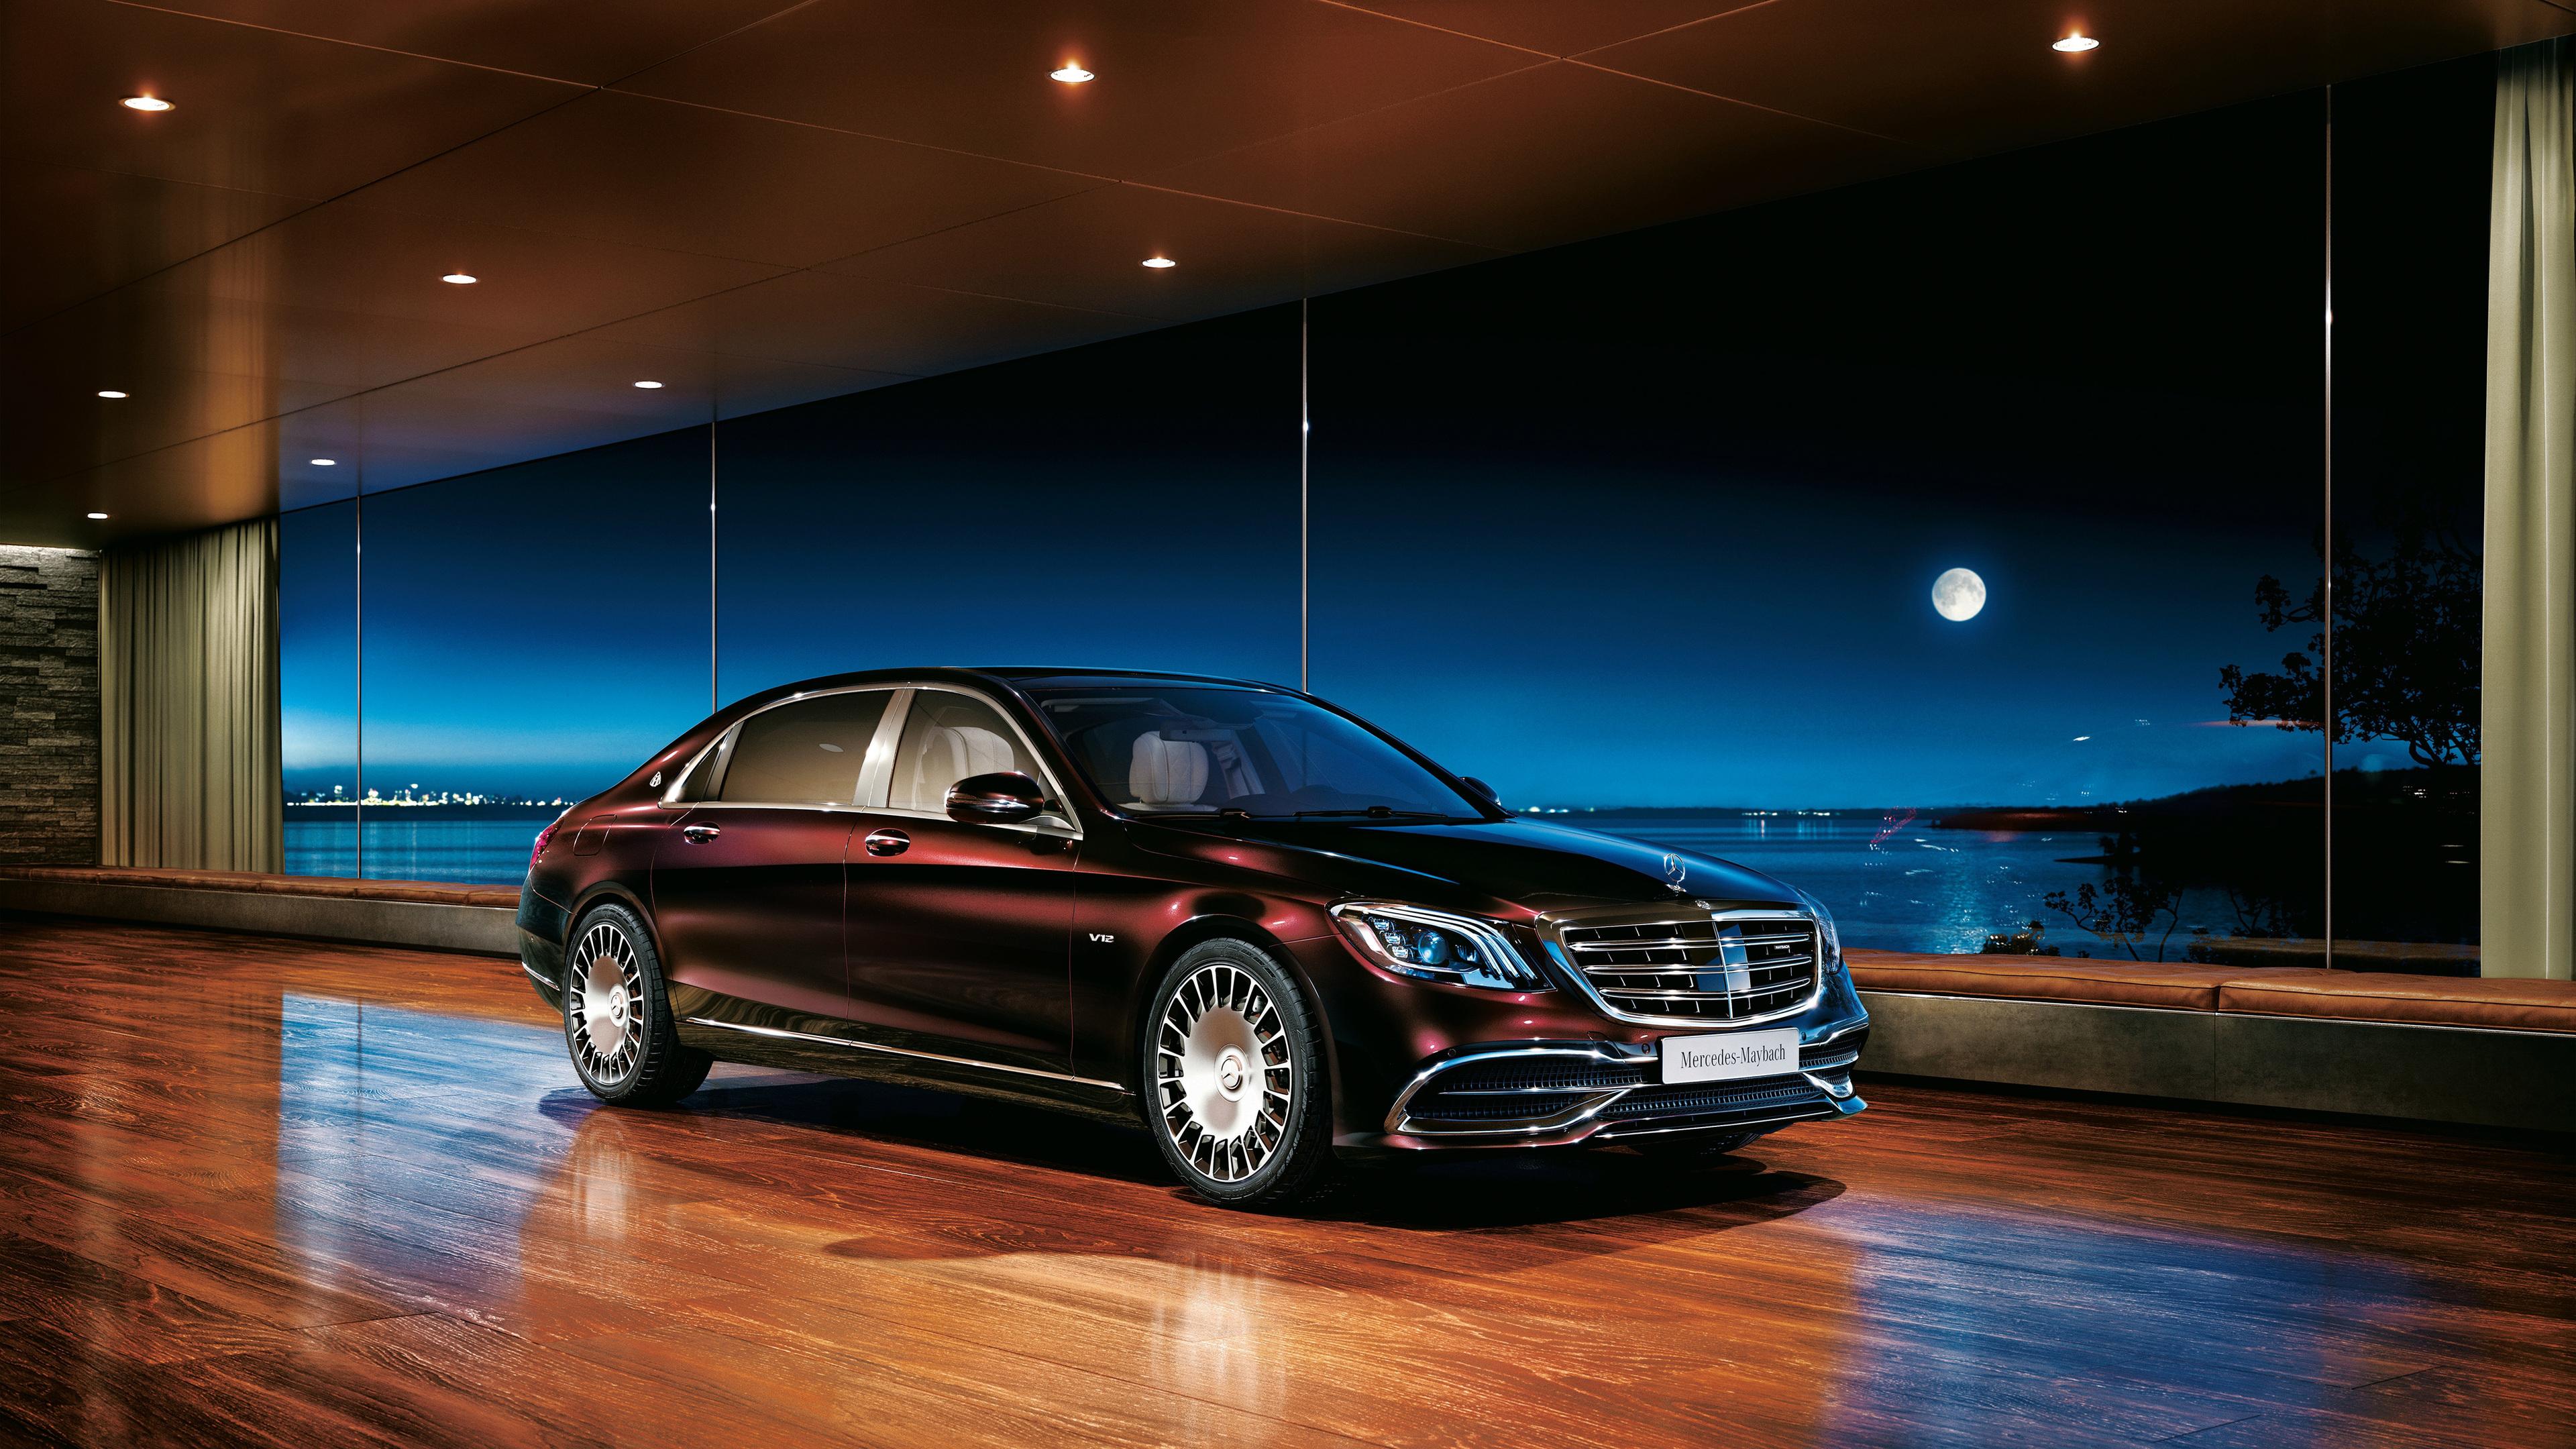 2018 mercedes benz s 650 1539109964 - 2018 Mercedes Benz S 650 - mercedes wallpapers, mercedes s class wallpapers, mercedes benz wallpapers, hd-wallpapers, cars wallpapers, 4k-wallpapers, 2018 cars wallpapers